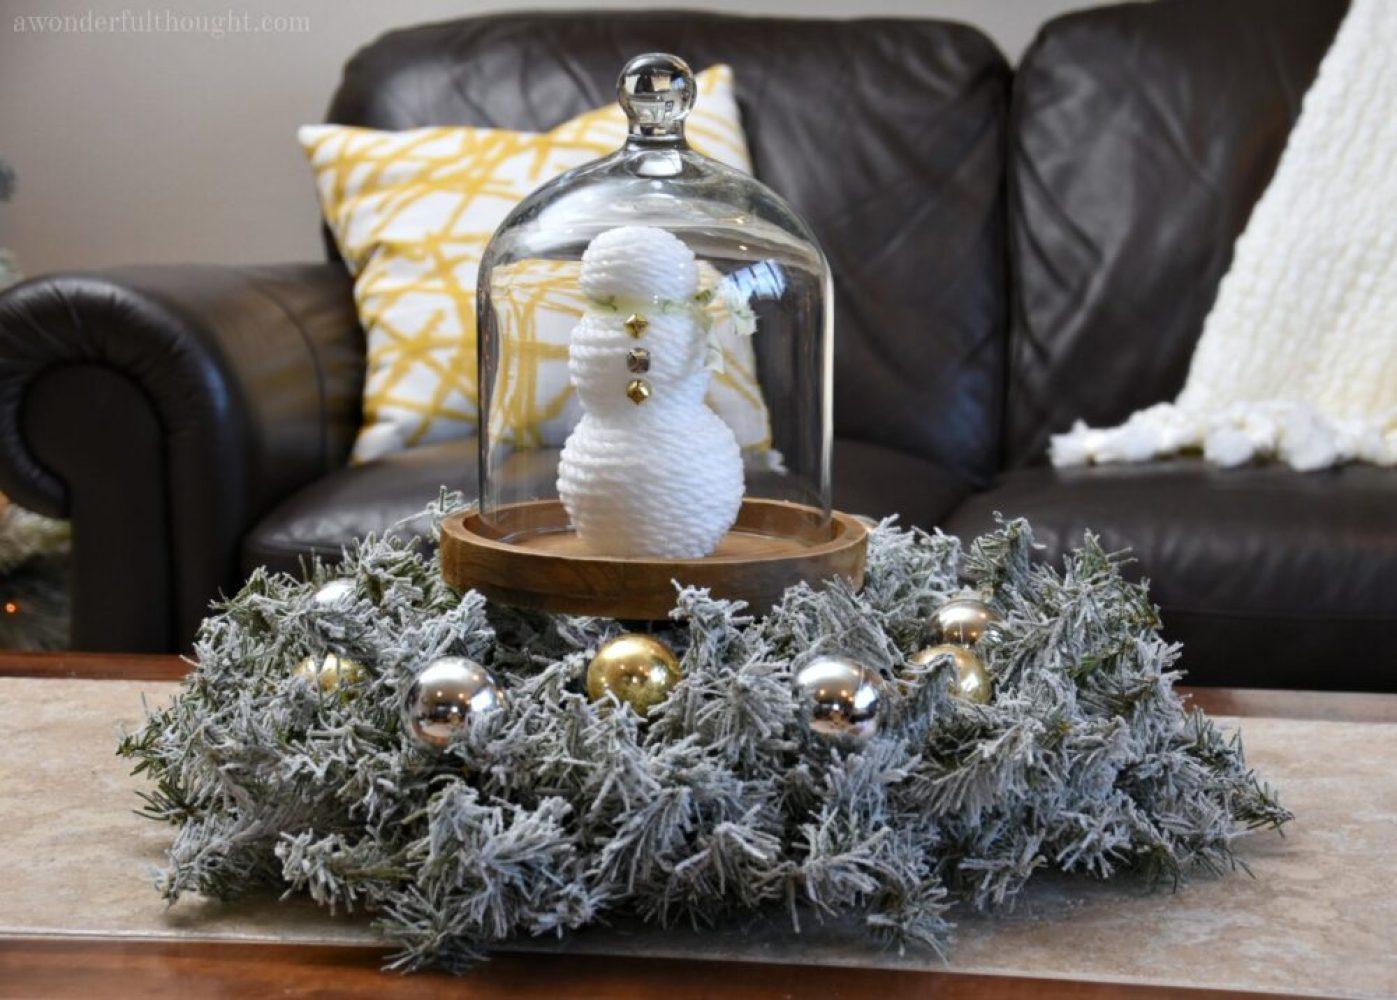 Abstract Snowman DIY #snowman #christmascraft #winterdecor #awonderfulthought.com